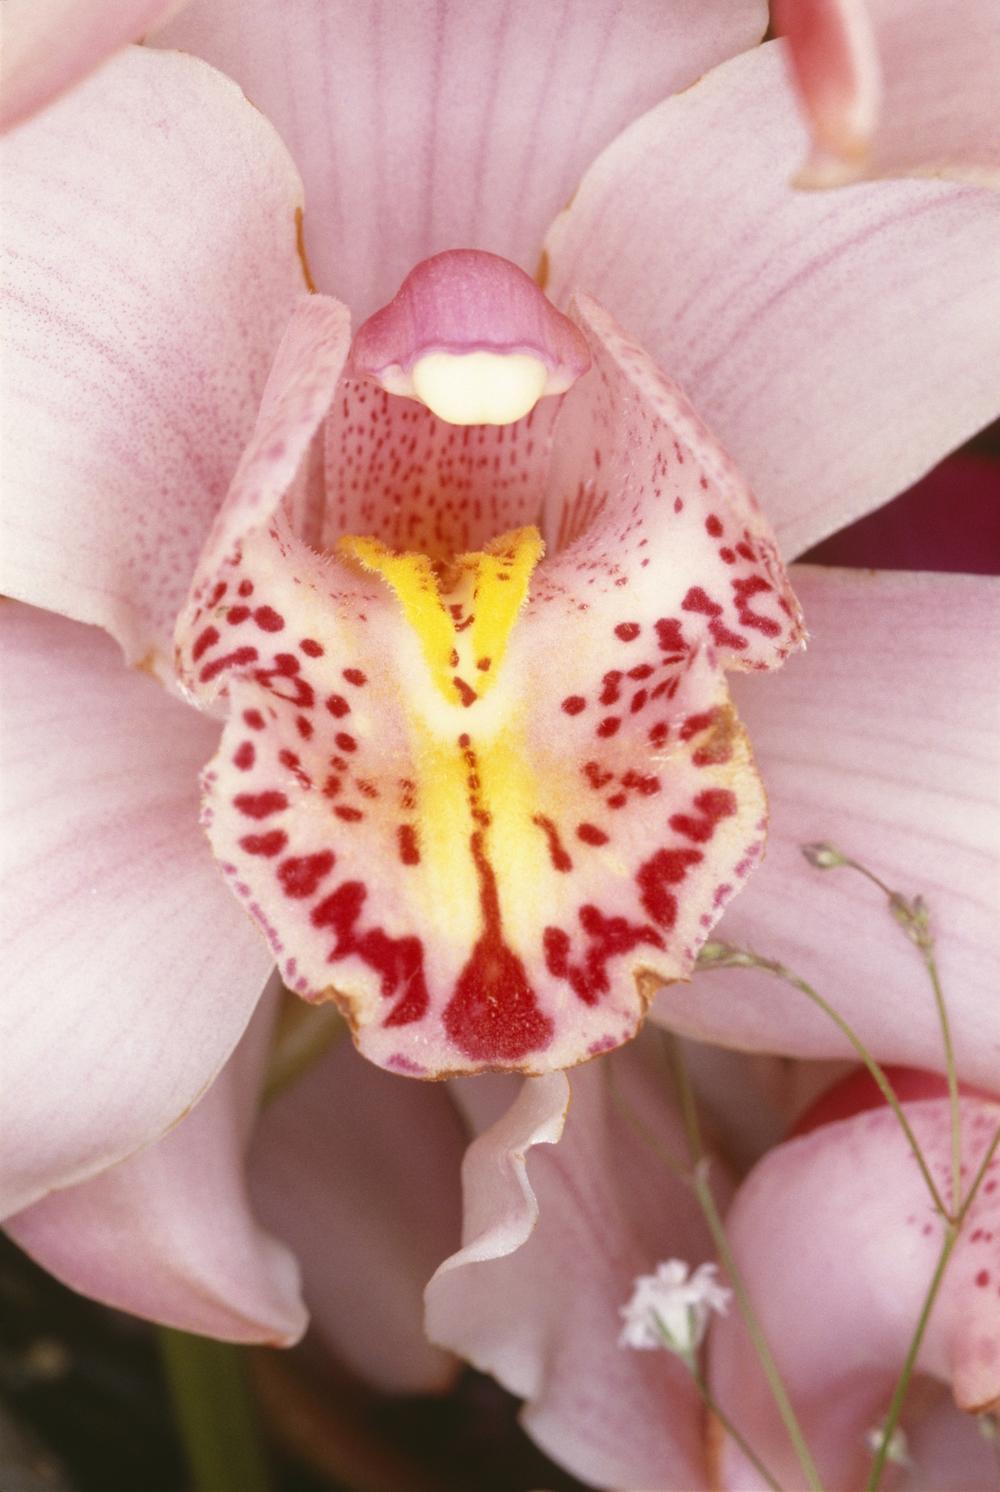 Erotic flowers